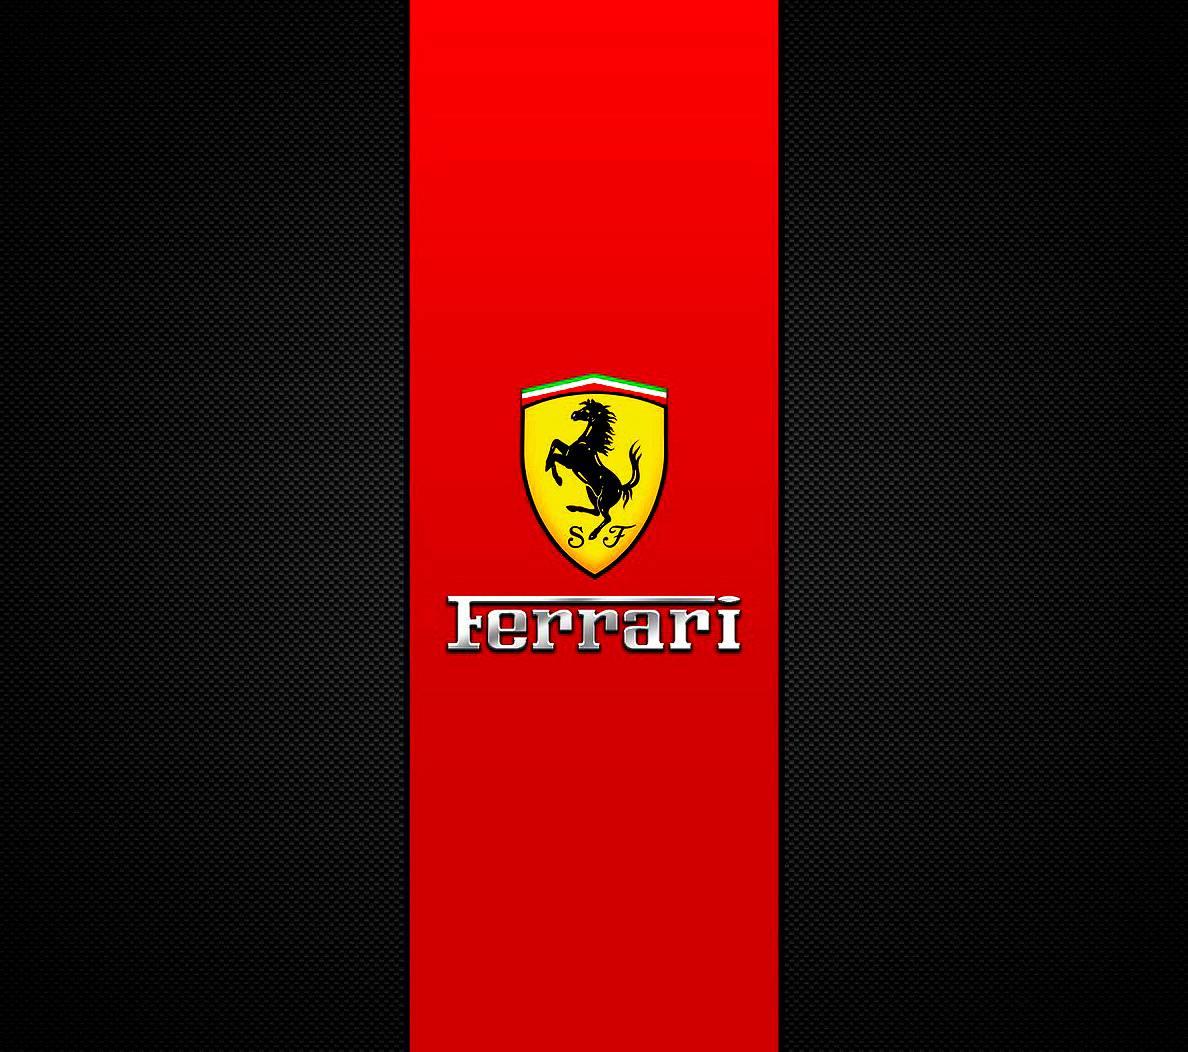 Ferrari F9: Ferrari Wallpaper By Loveless1982